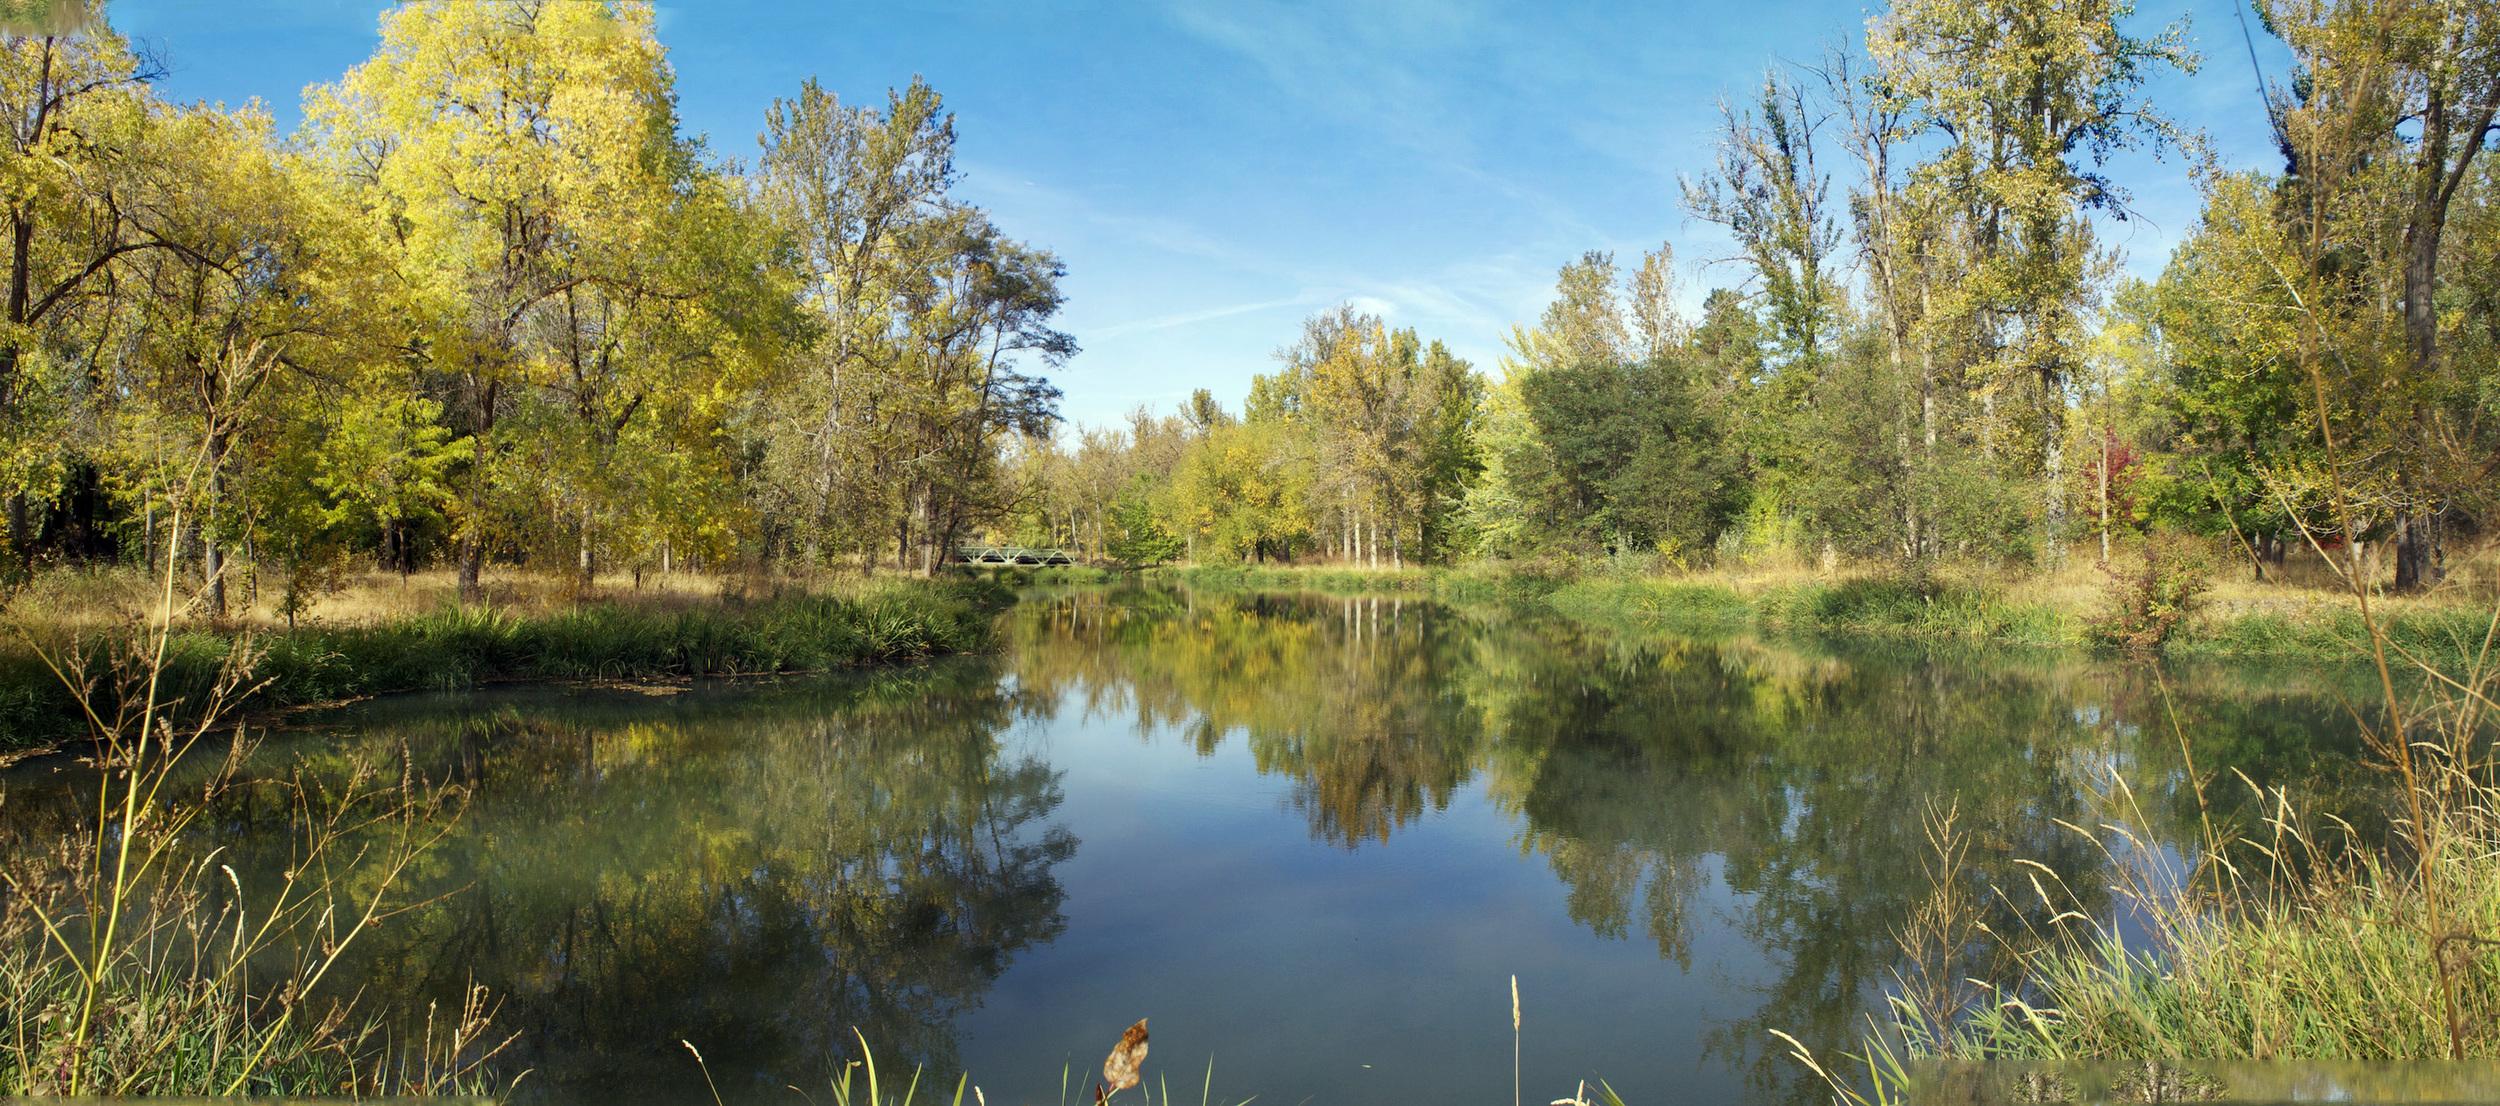 PondPan, 10-9-dkr pond.jpg